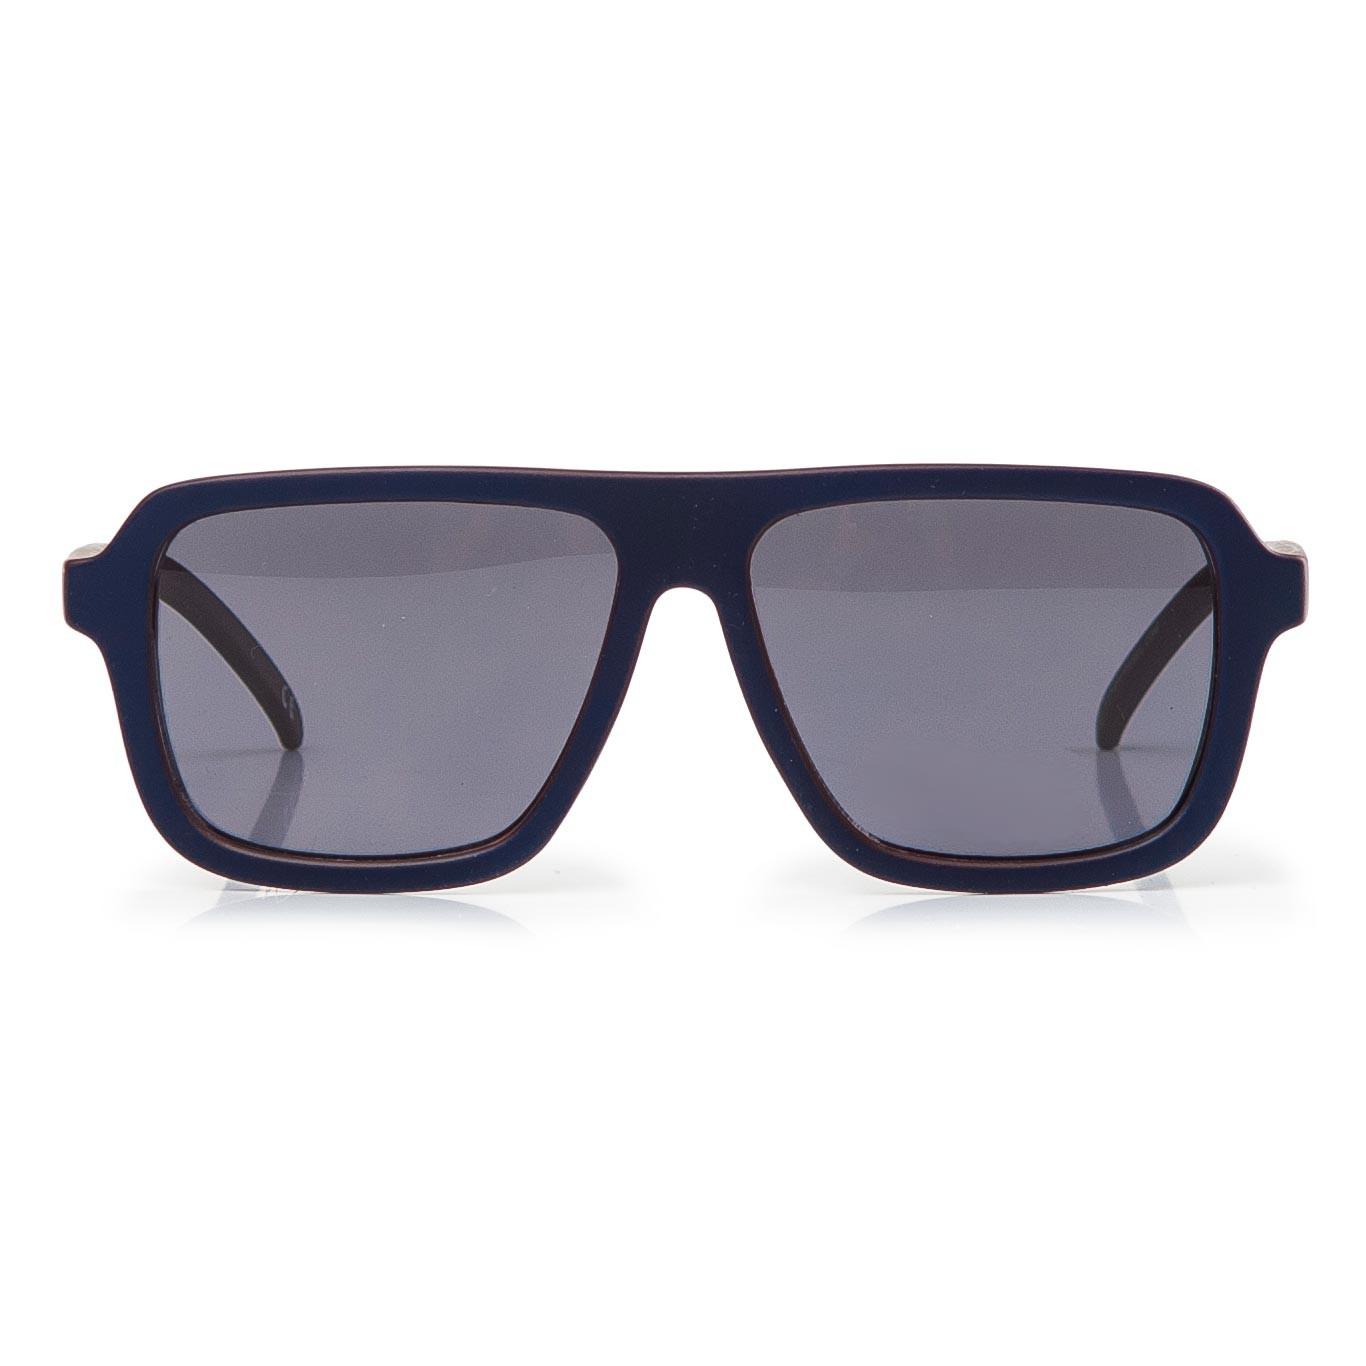 Slnečné okuliare Vans Evray Shades dress blues port  32a6dfaec9b